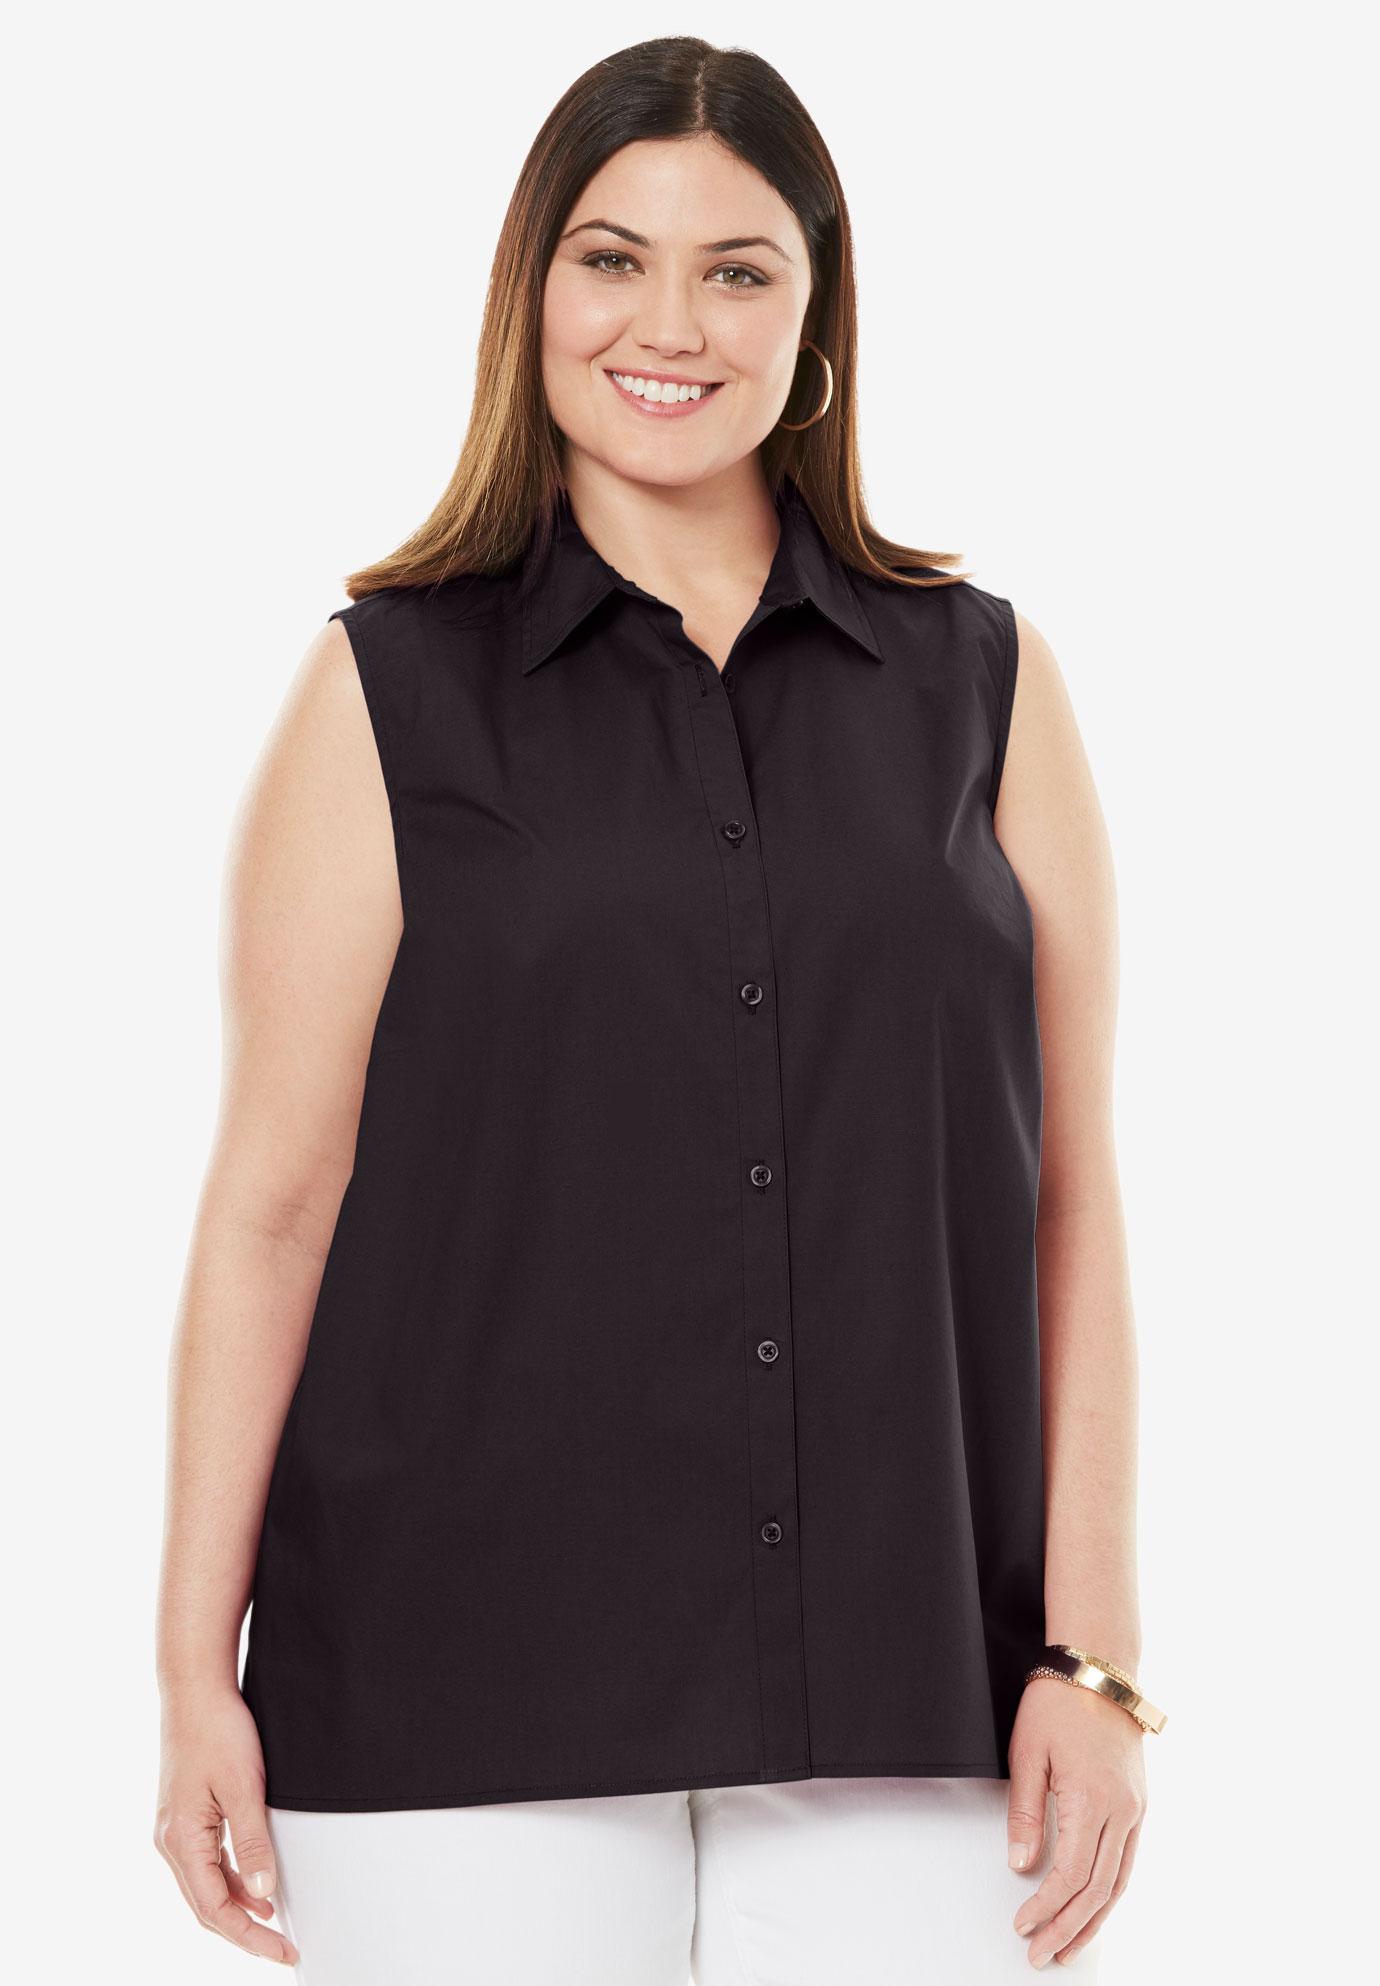 a8d5abc9 Sleeveless Poplin Blouse | Plus Size Shirts & Blouses | Full Beauty